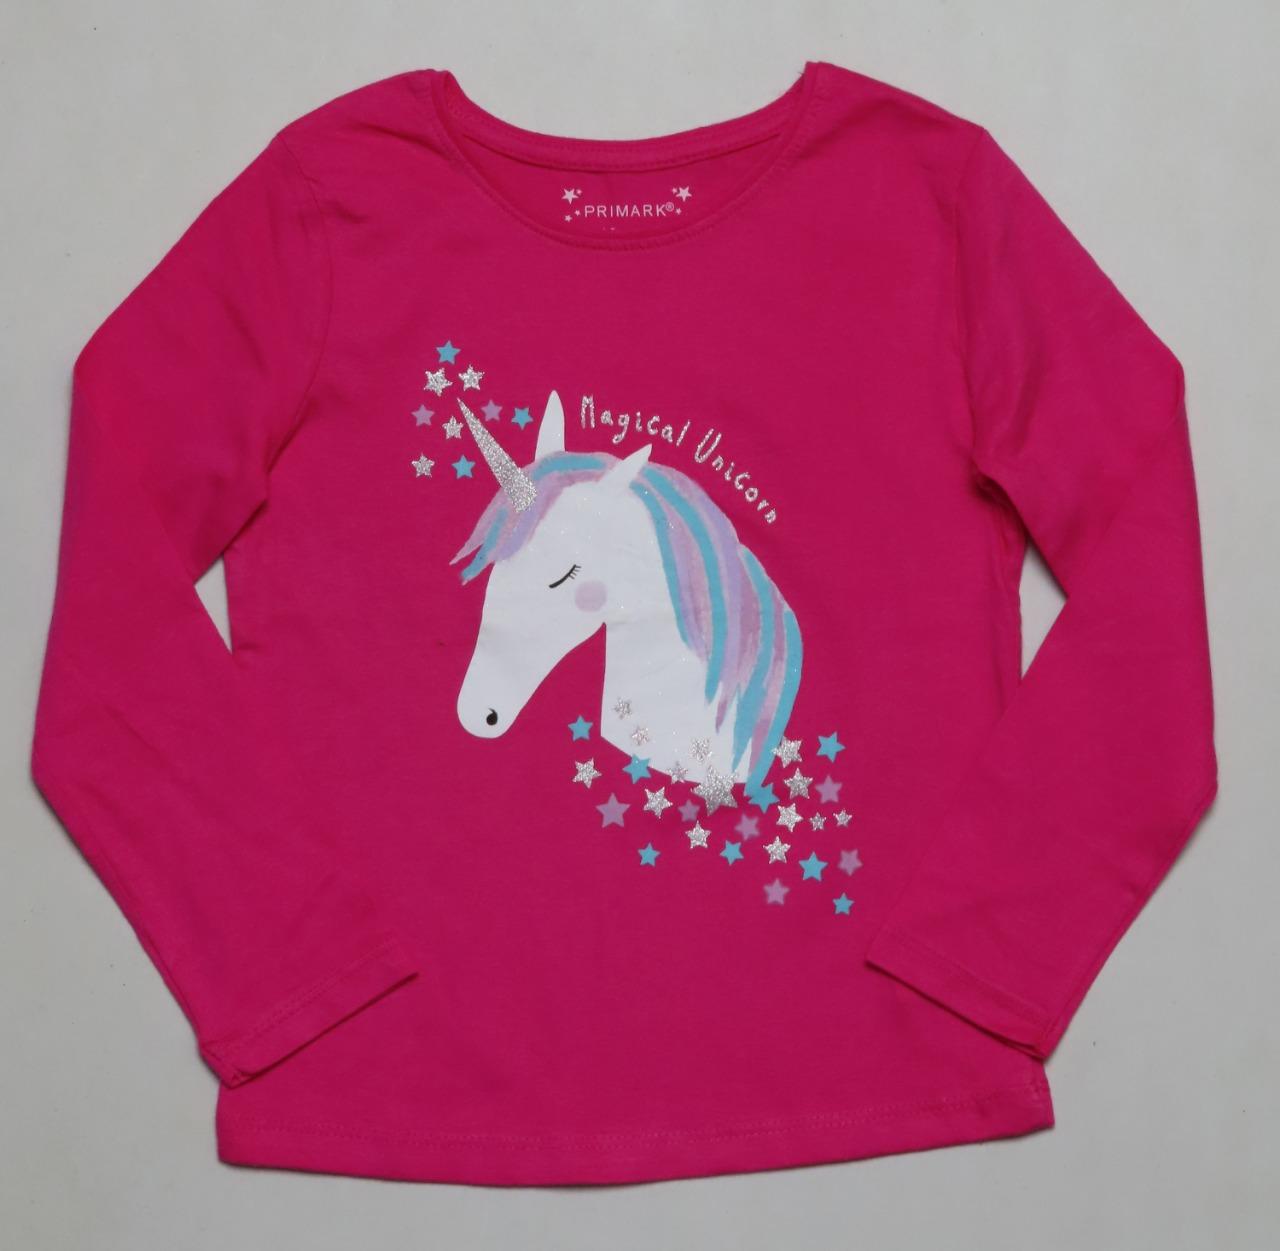 Unicorn Glitter Printed Girls T Shirt